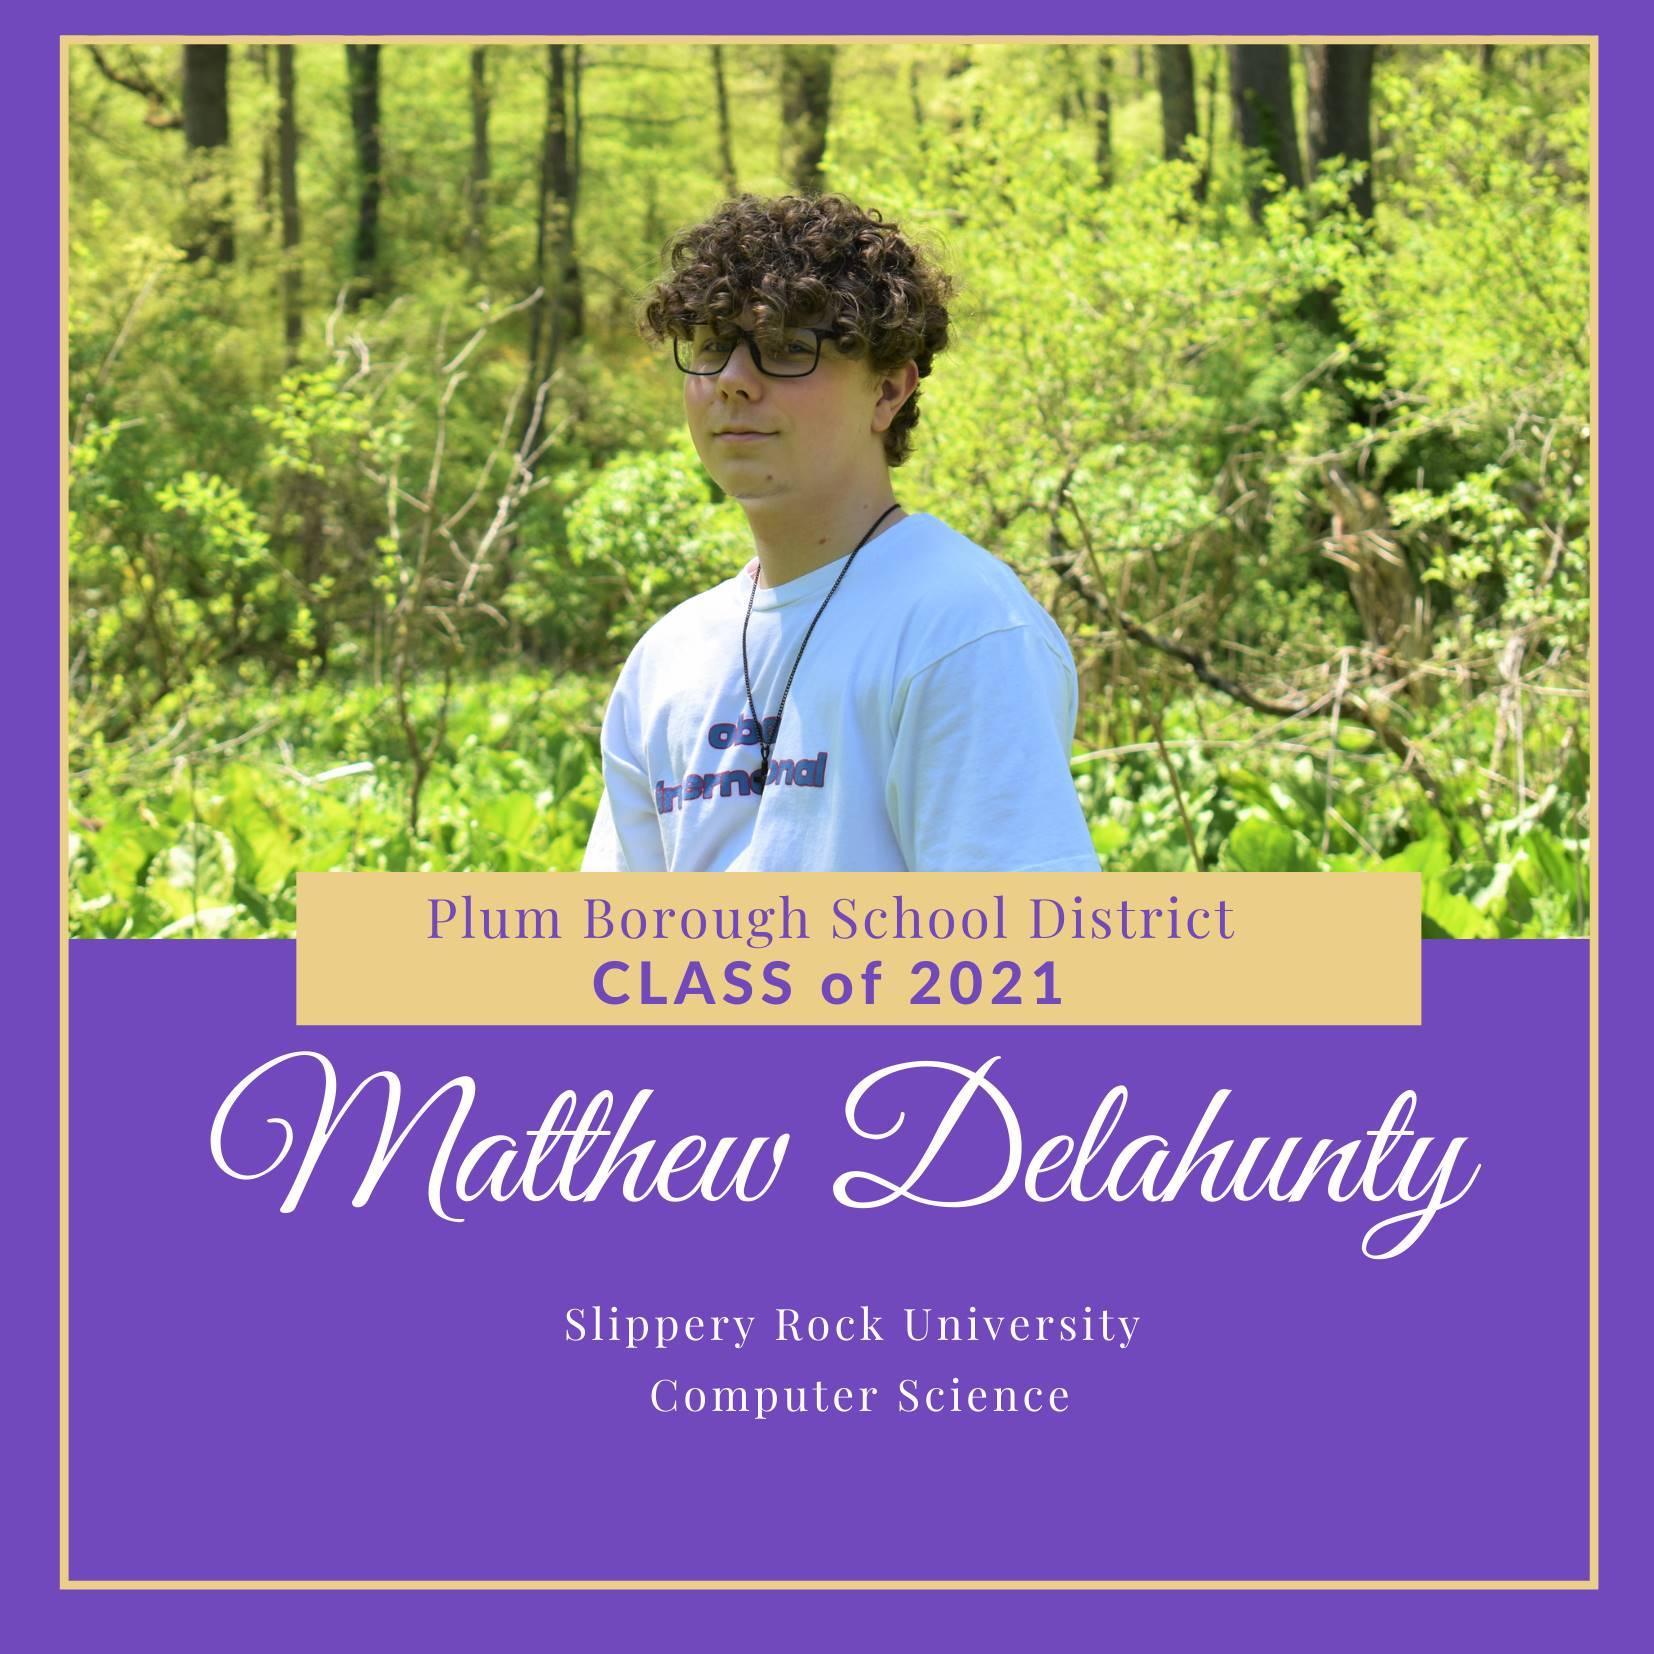 Congratulations to Matthew Delahunty, Class of 2021!